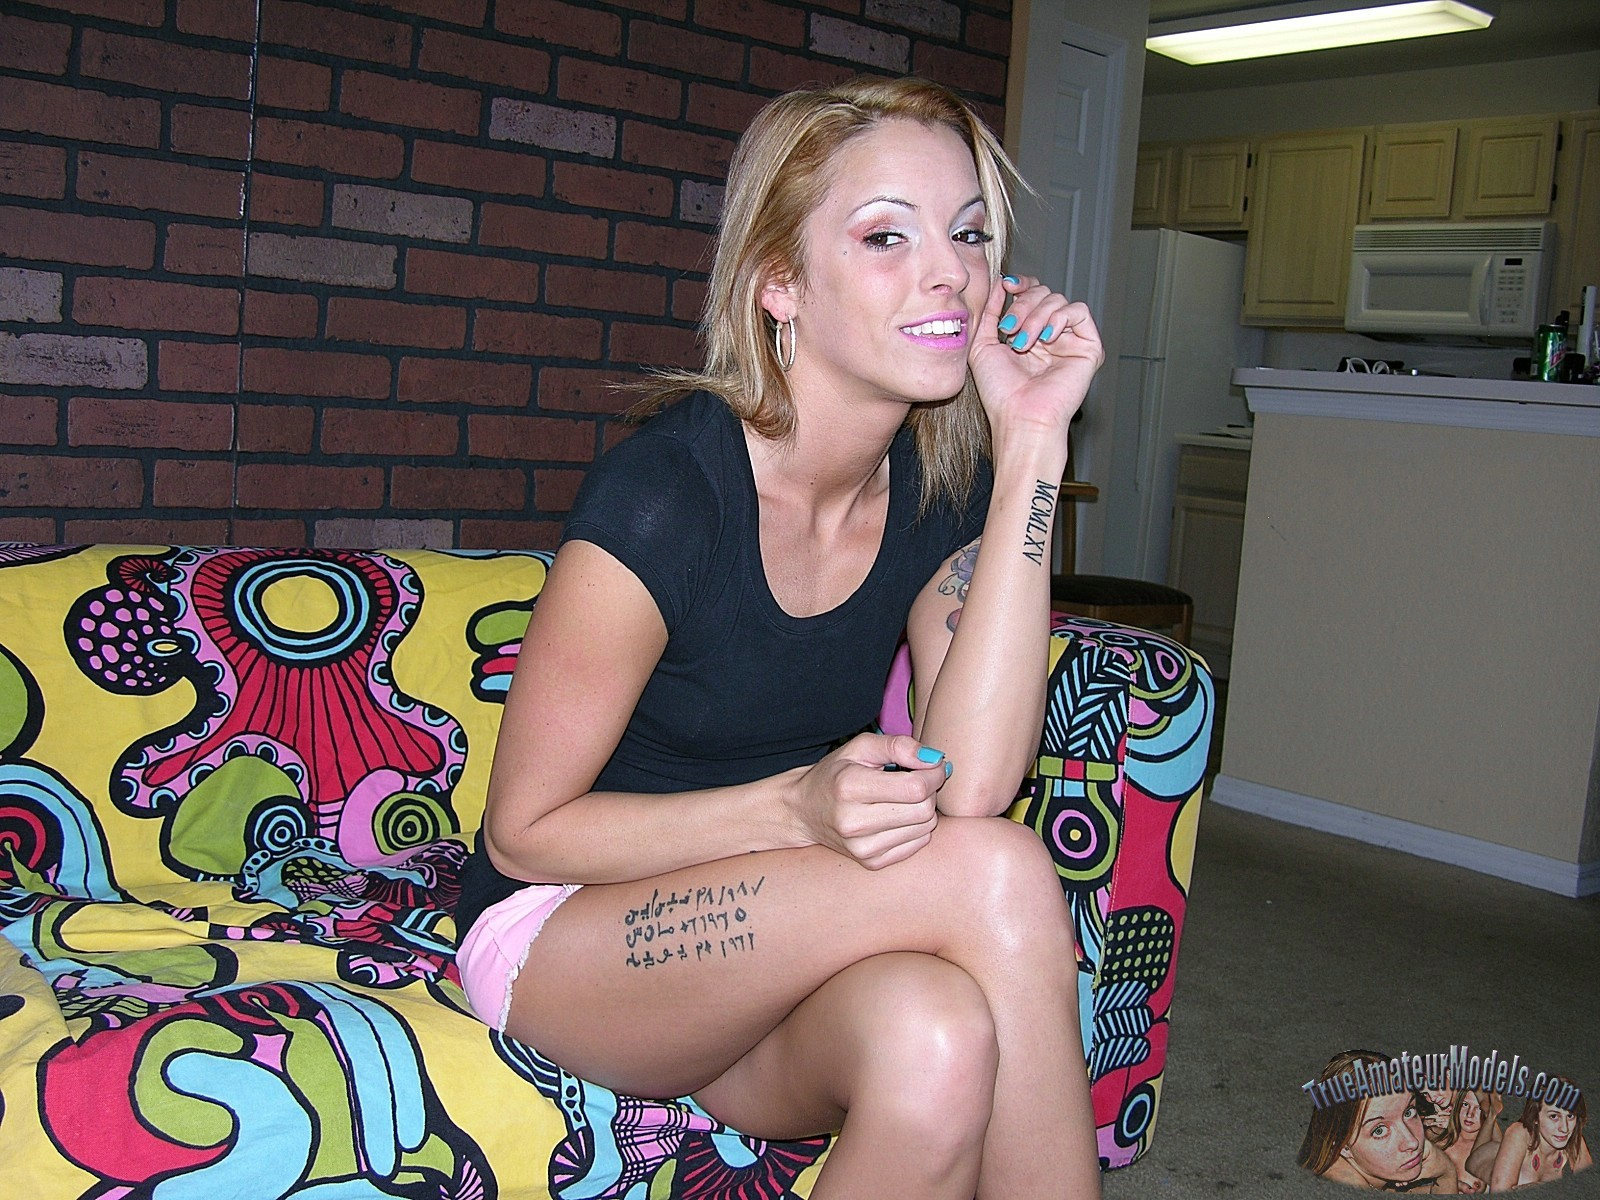 Nude tattooed amateur mature milf bella - true amateur models